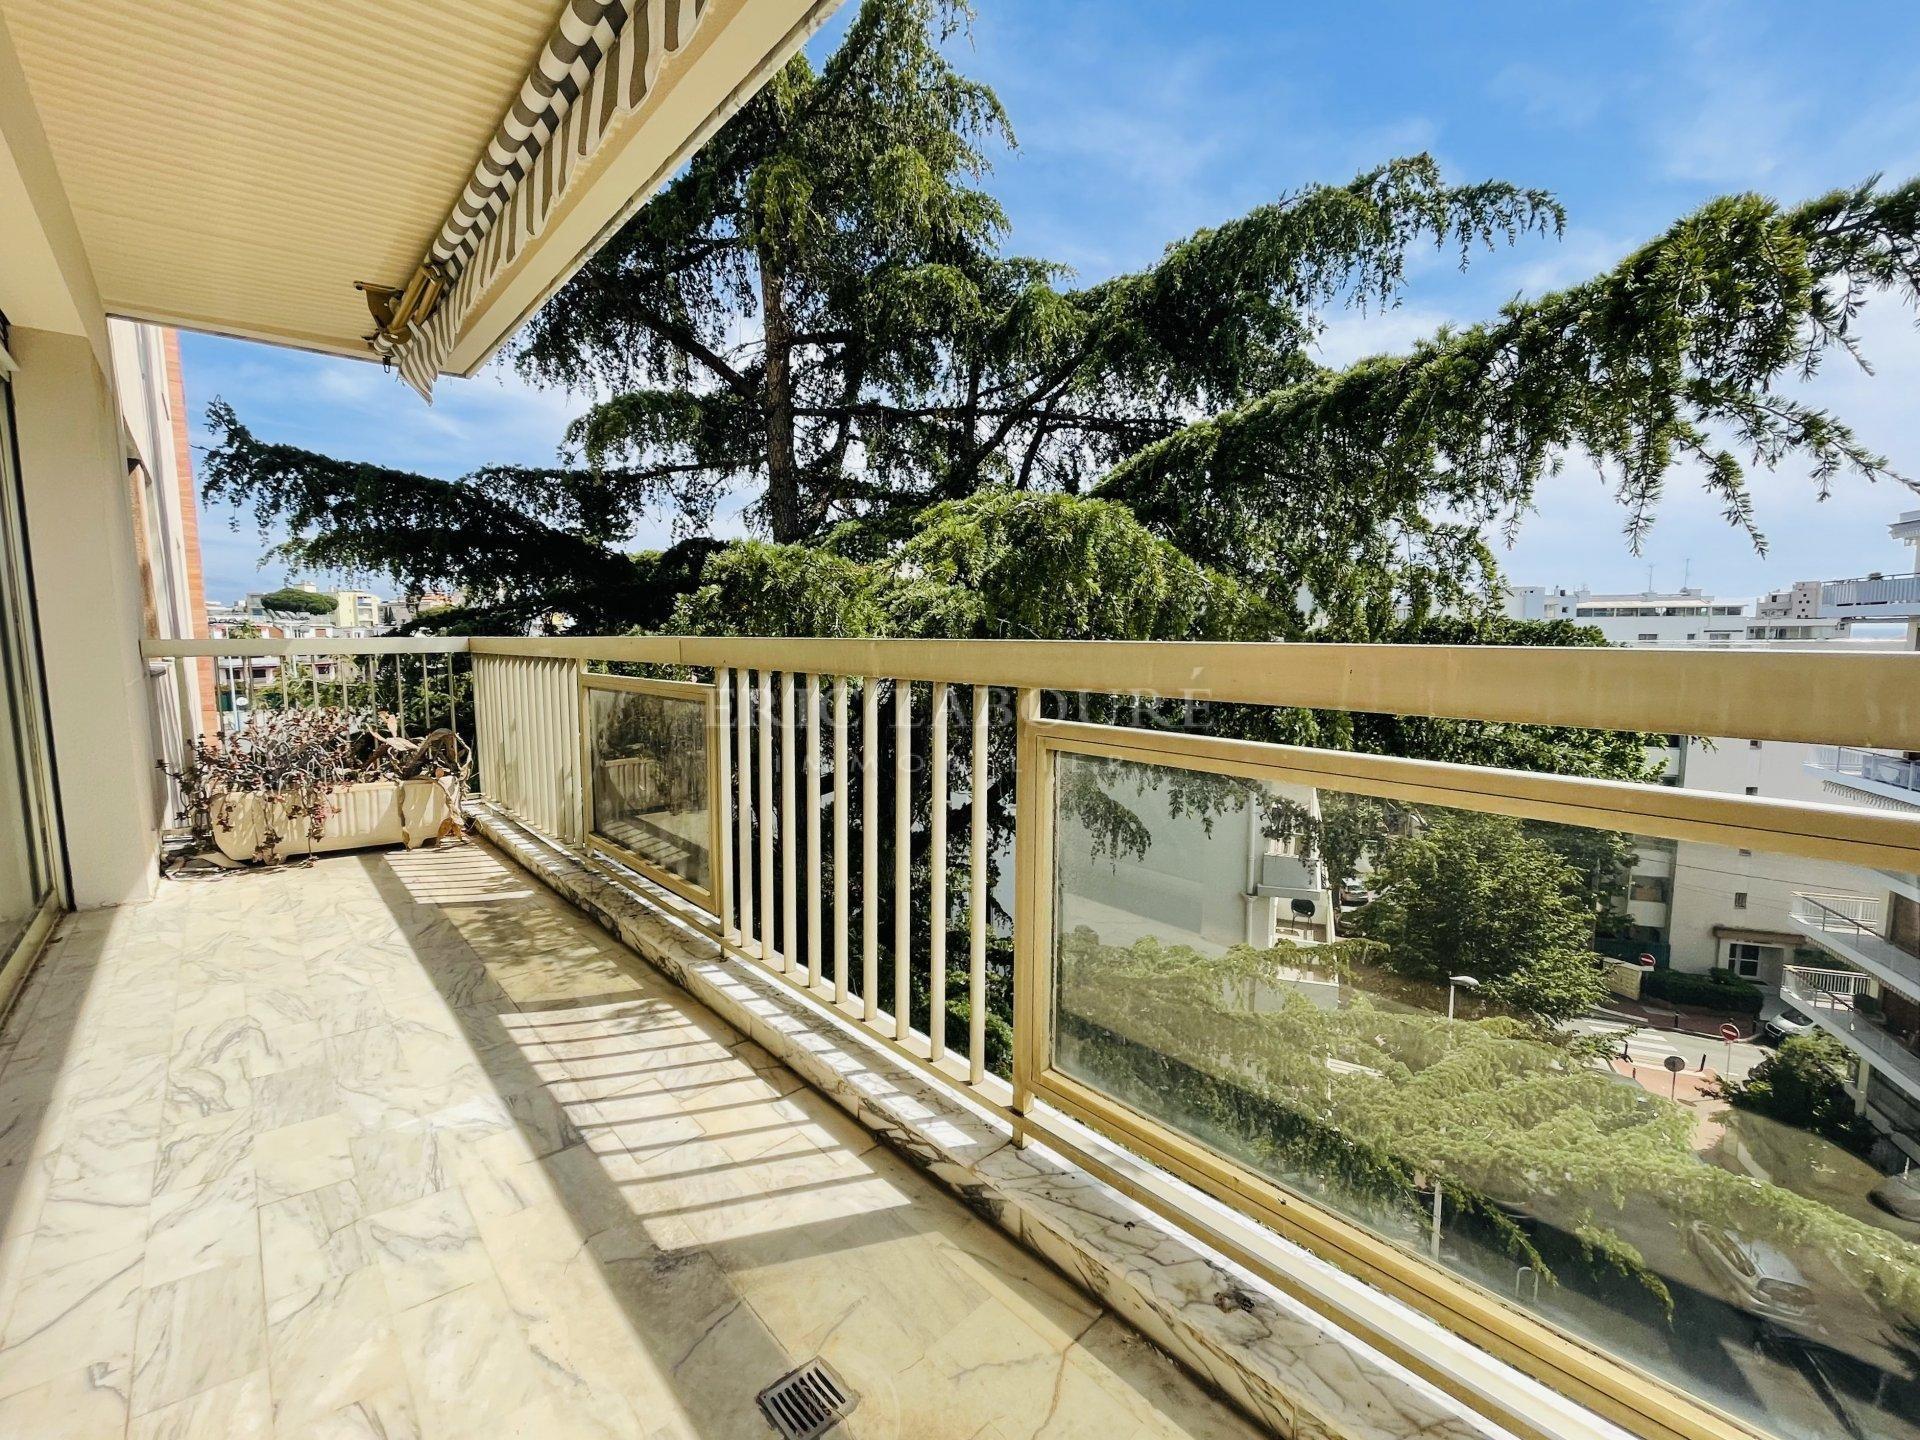 Seasonal rental Apartment - Cannes Pointe Croisette